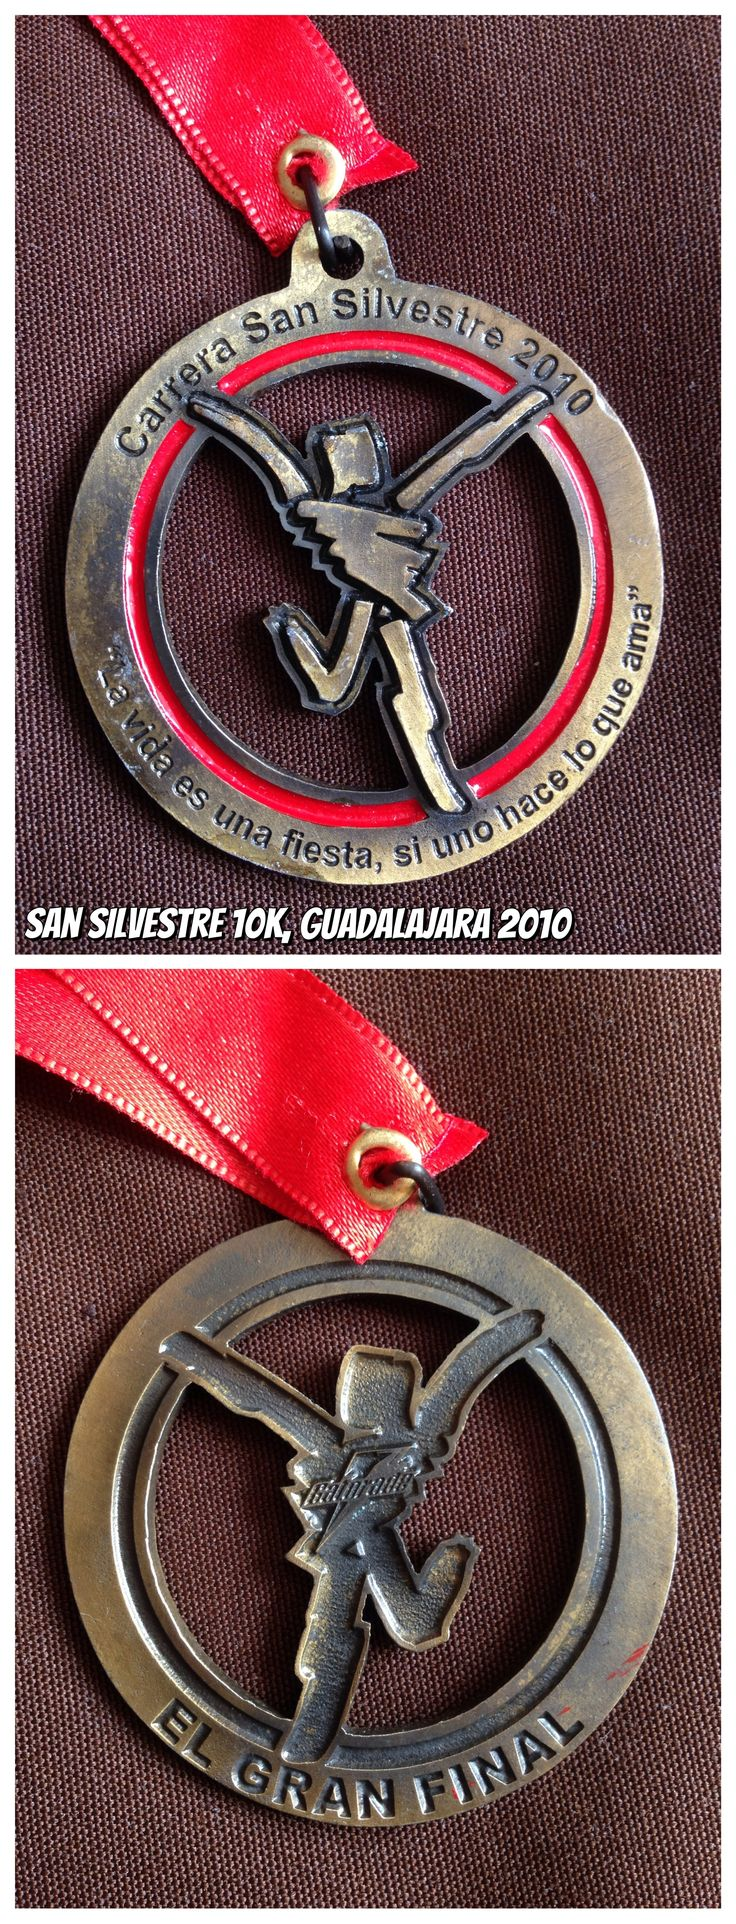 San Silvestre 10K @ Guadalajara 2010